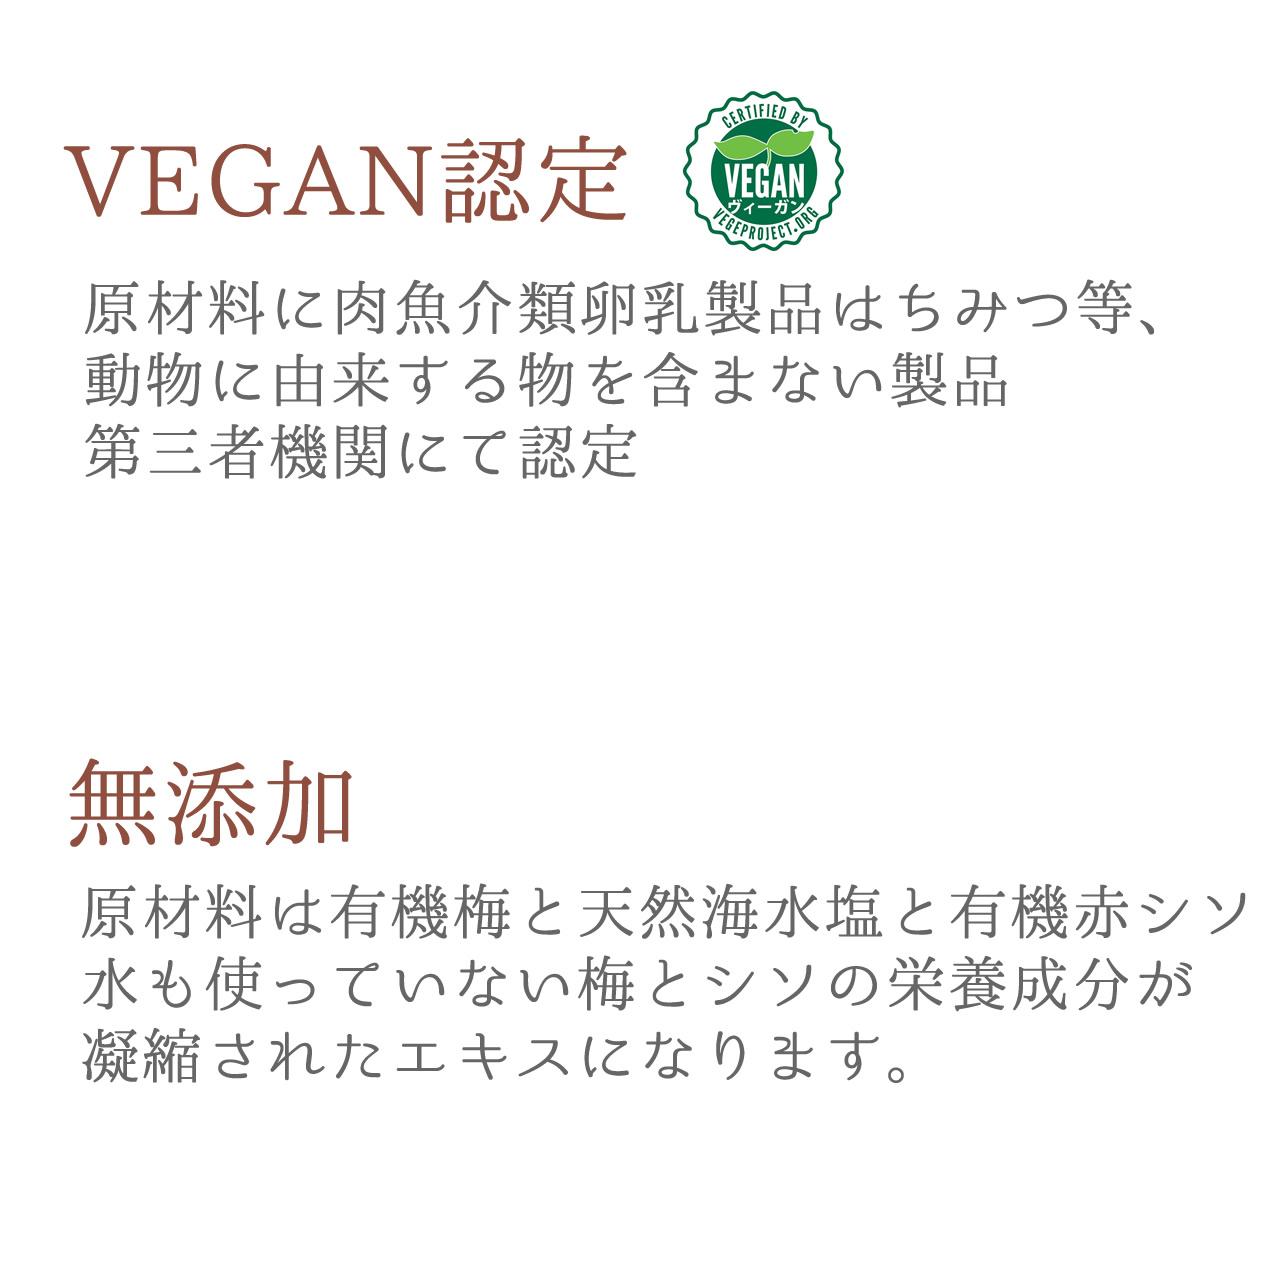 VEGAN認定を受けたオーガニック赤シソ梅酢